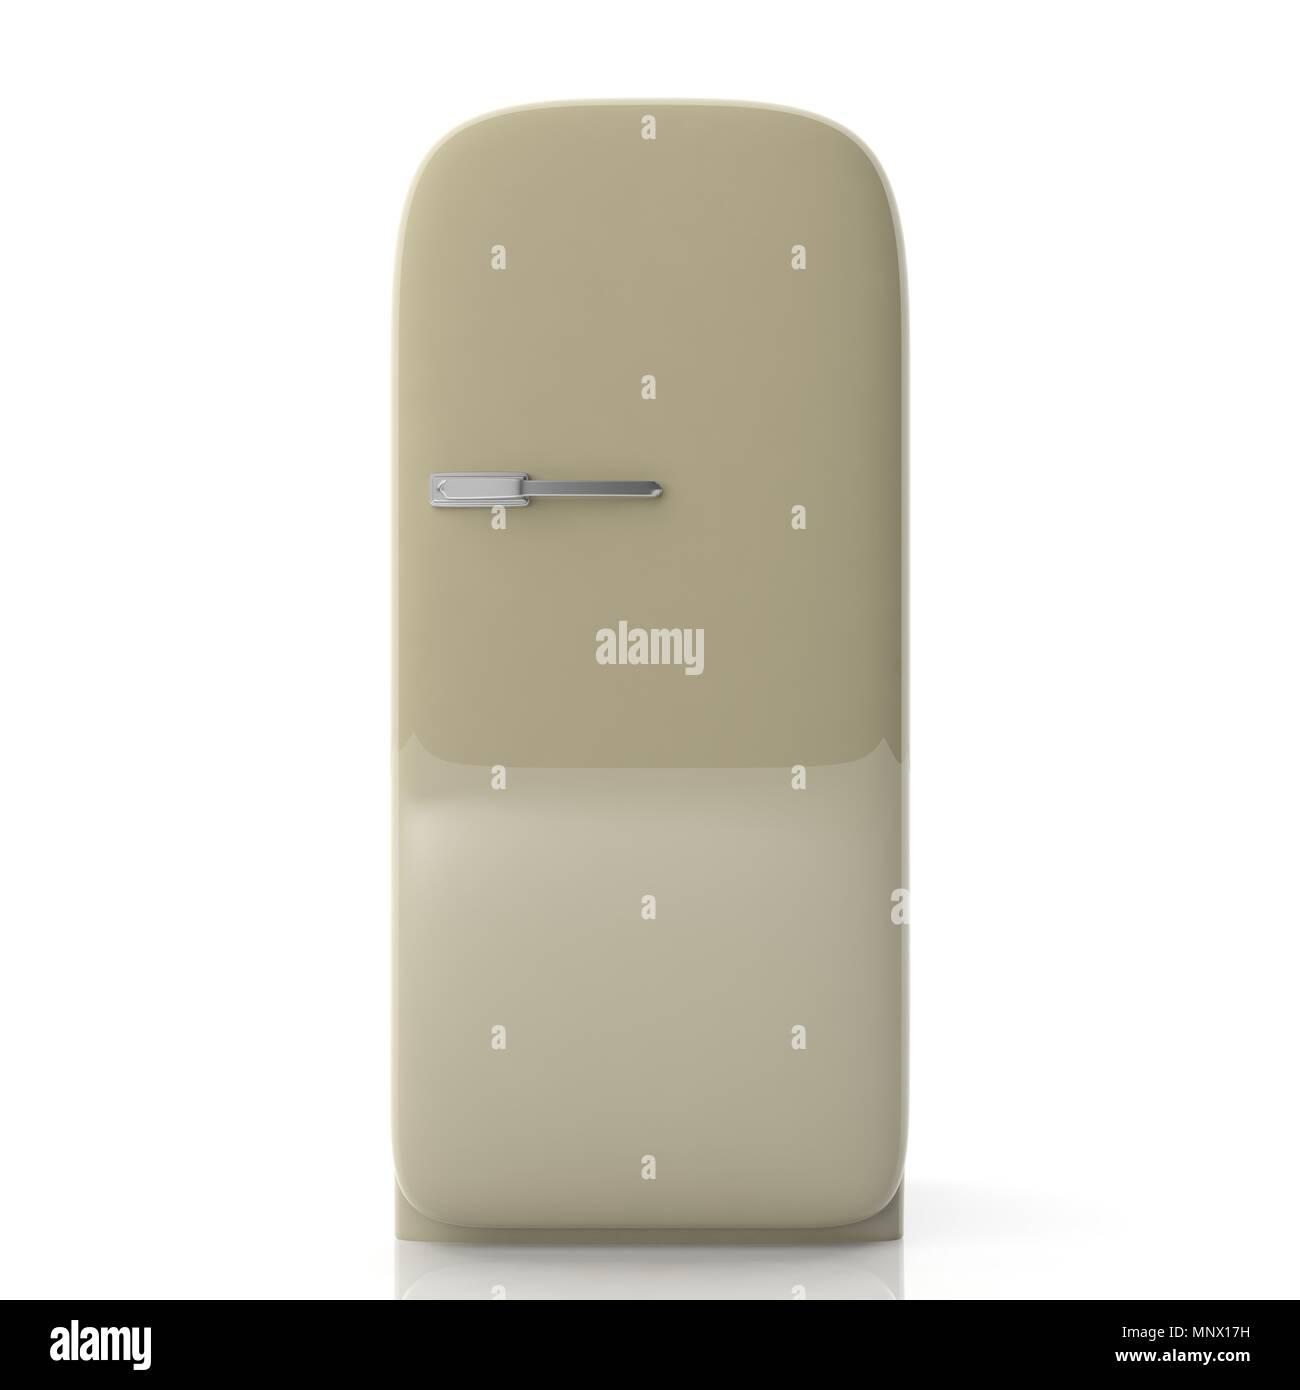 Retro Fridge Freezer Stockfotos & Retro Fridge Freezer Bilder - Alamy